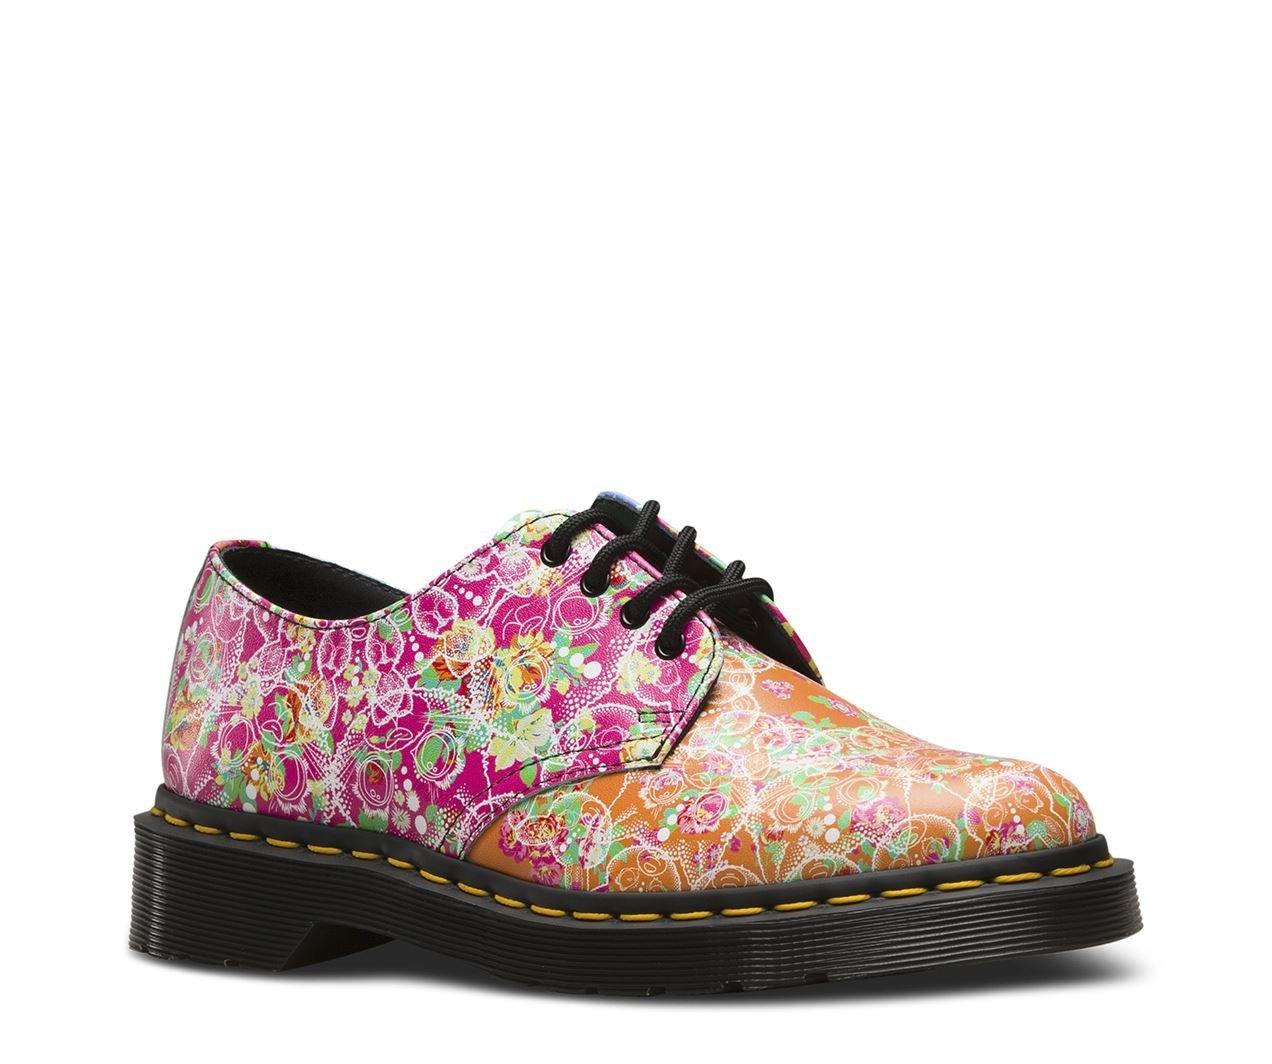 Dr.Martens Womens Smiths Daze Leather Shoes 36 EU Multi